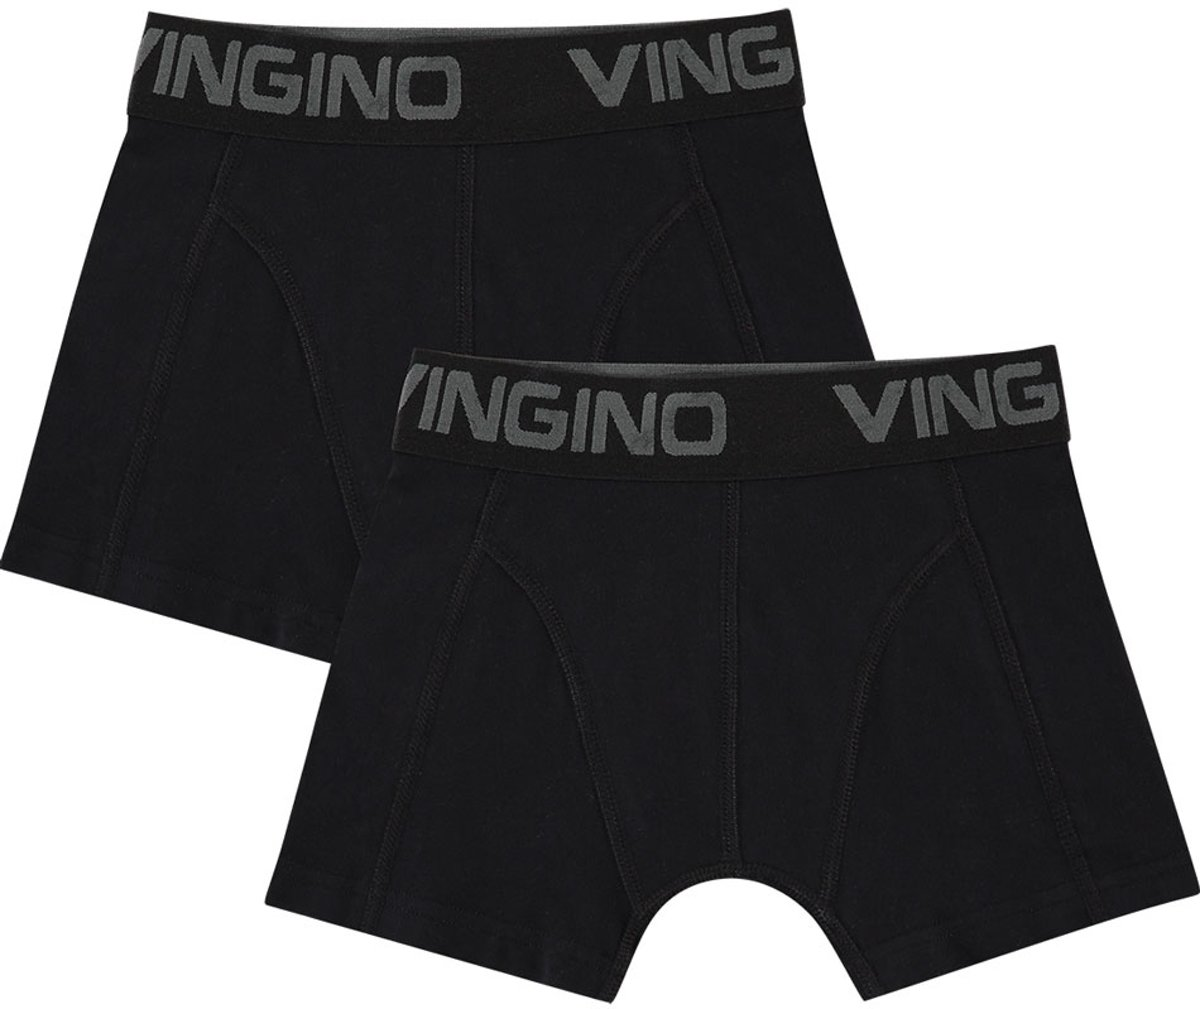 Vingino Jongens Boxershort 2-pack - Black - Maat 128